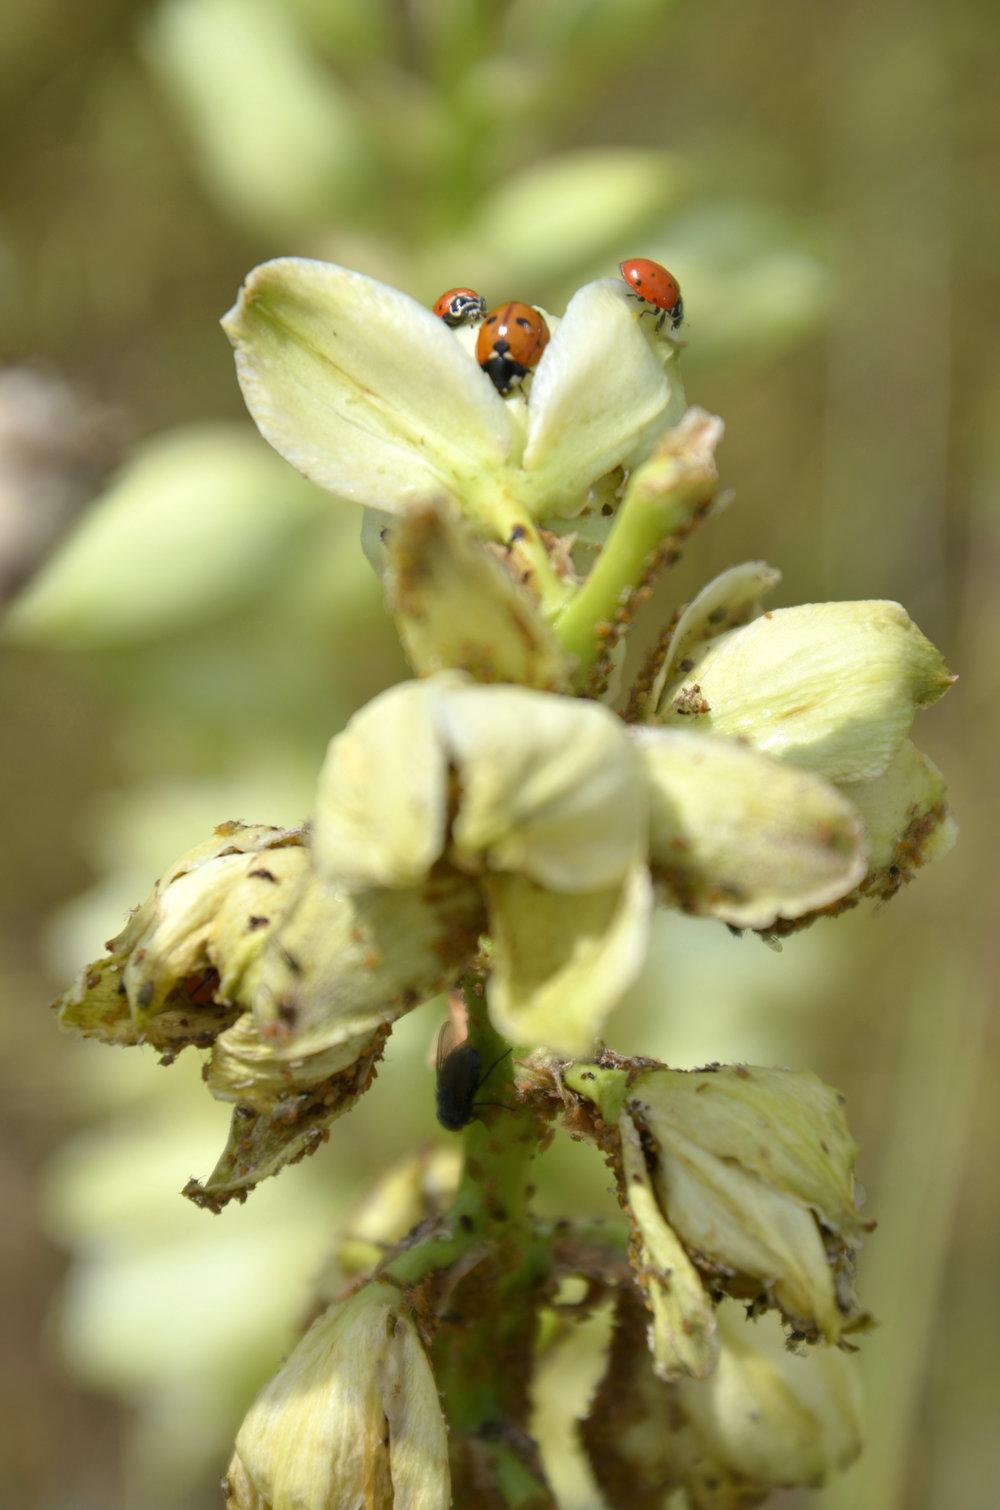 Ant, aphid, ladybug symbiosis on Yucca flower